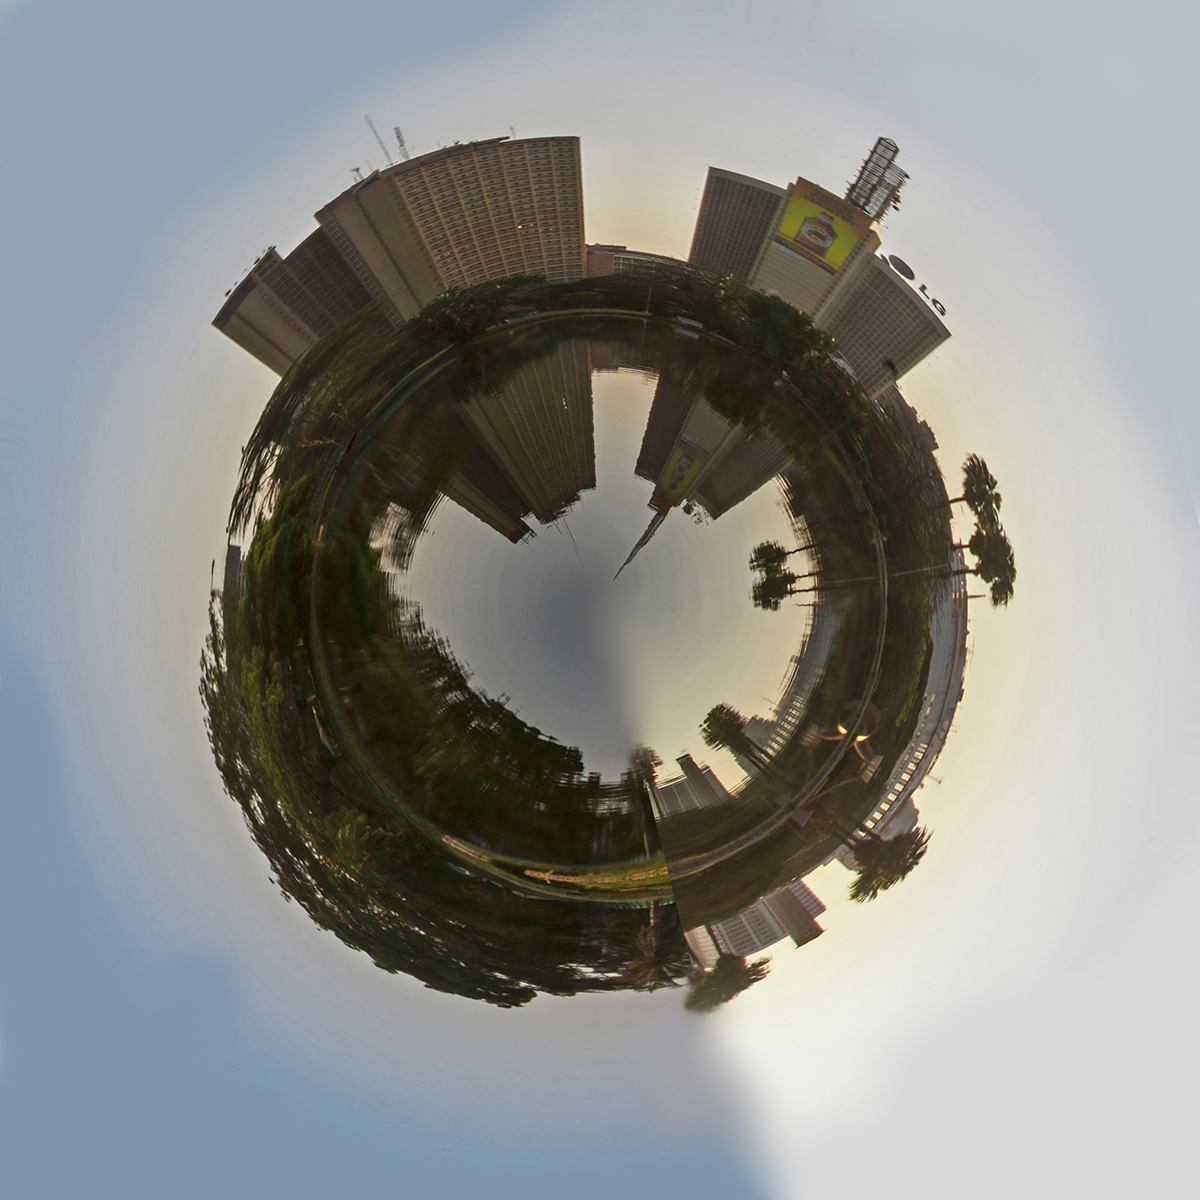 creative nairobi kenya cityscapes manipulation littleplanet